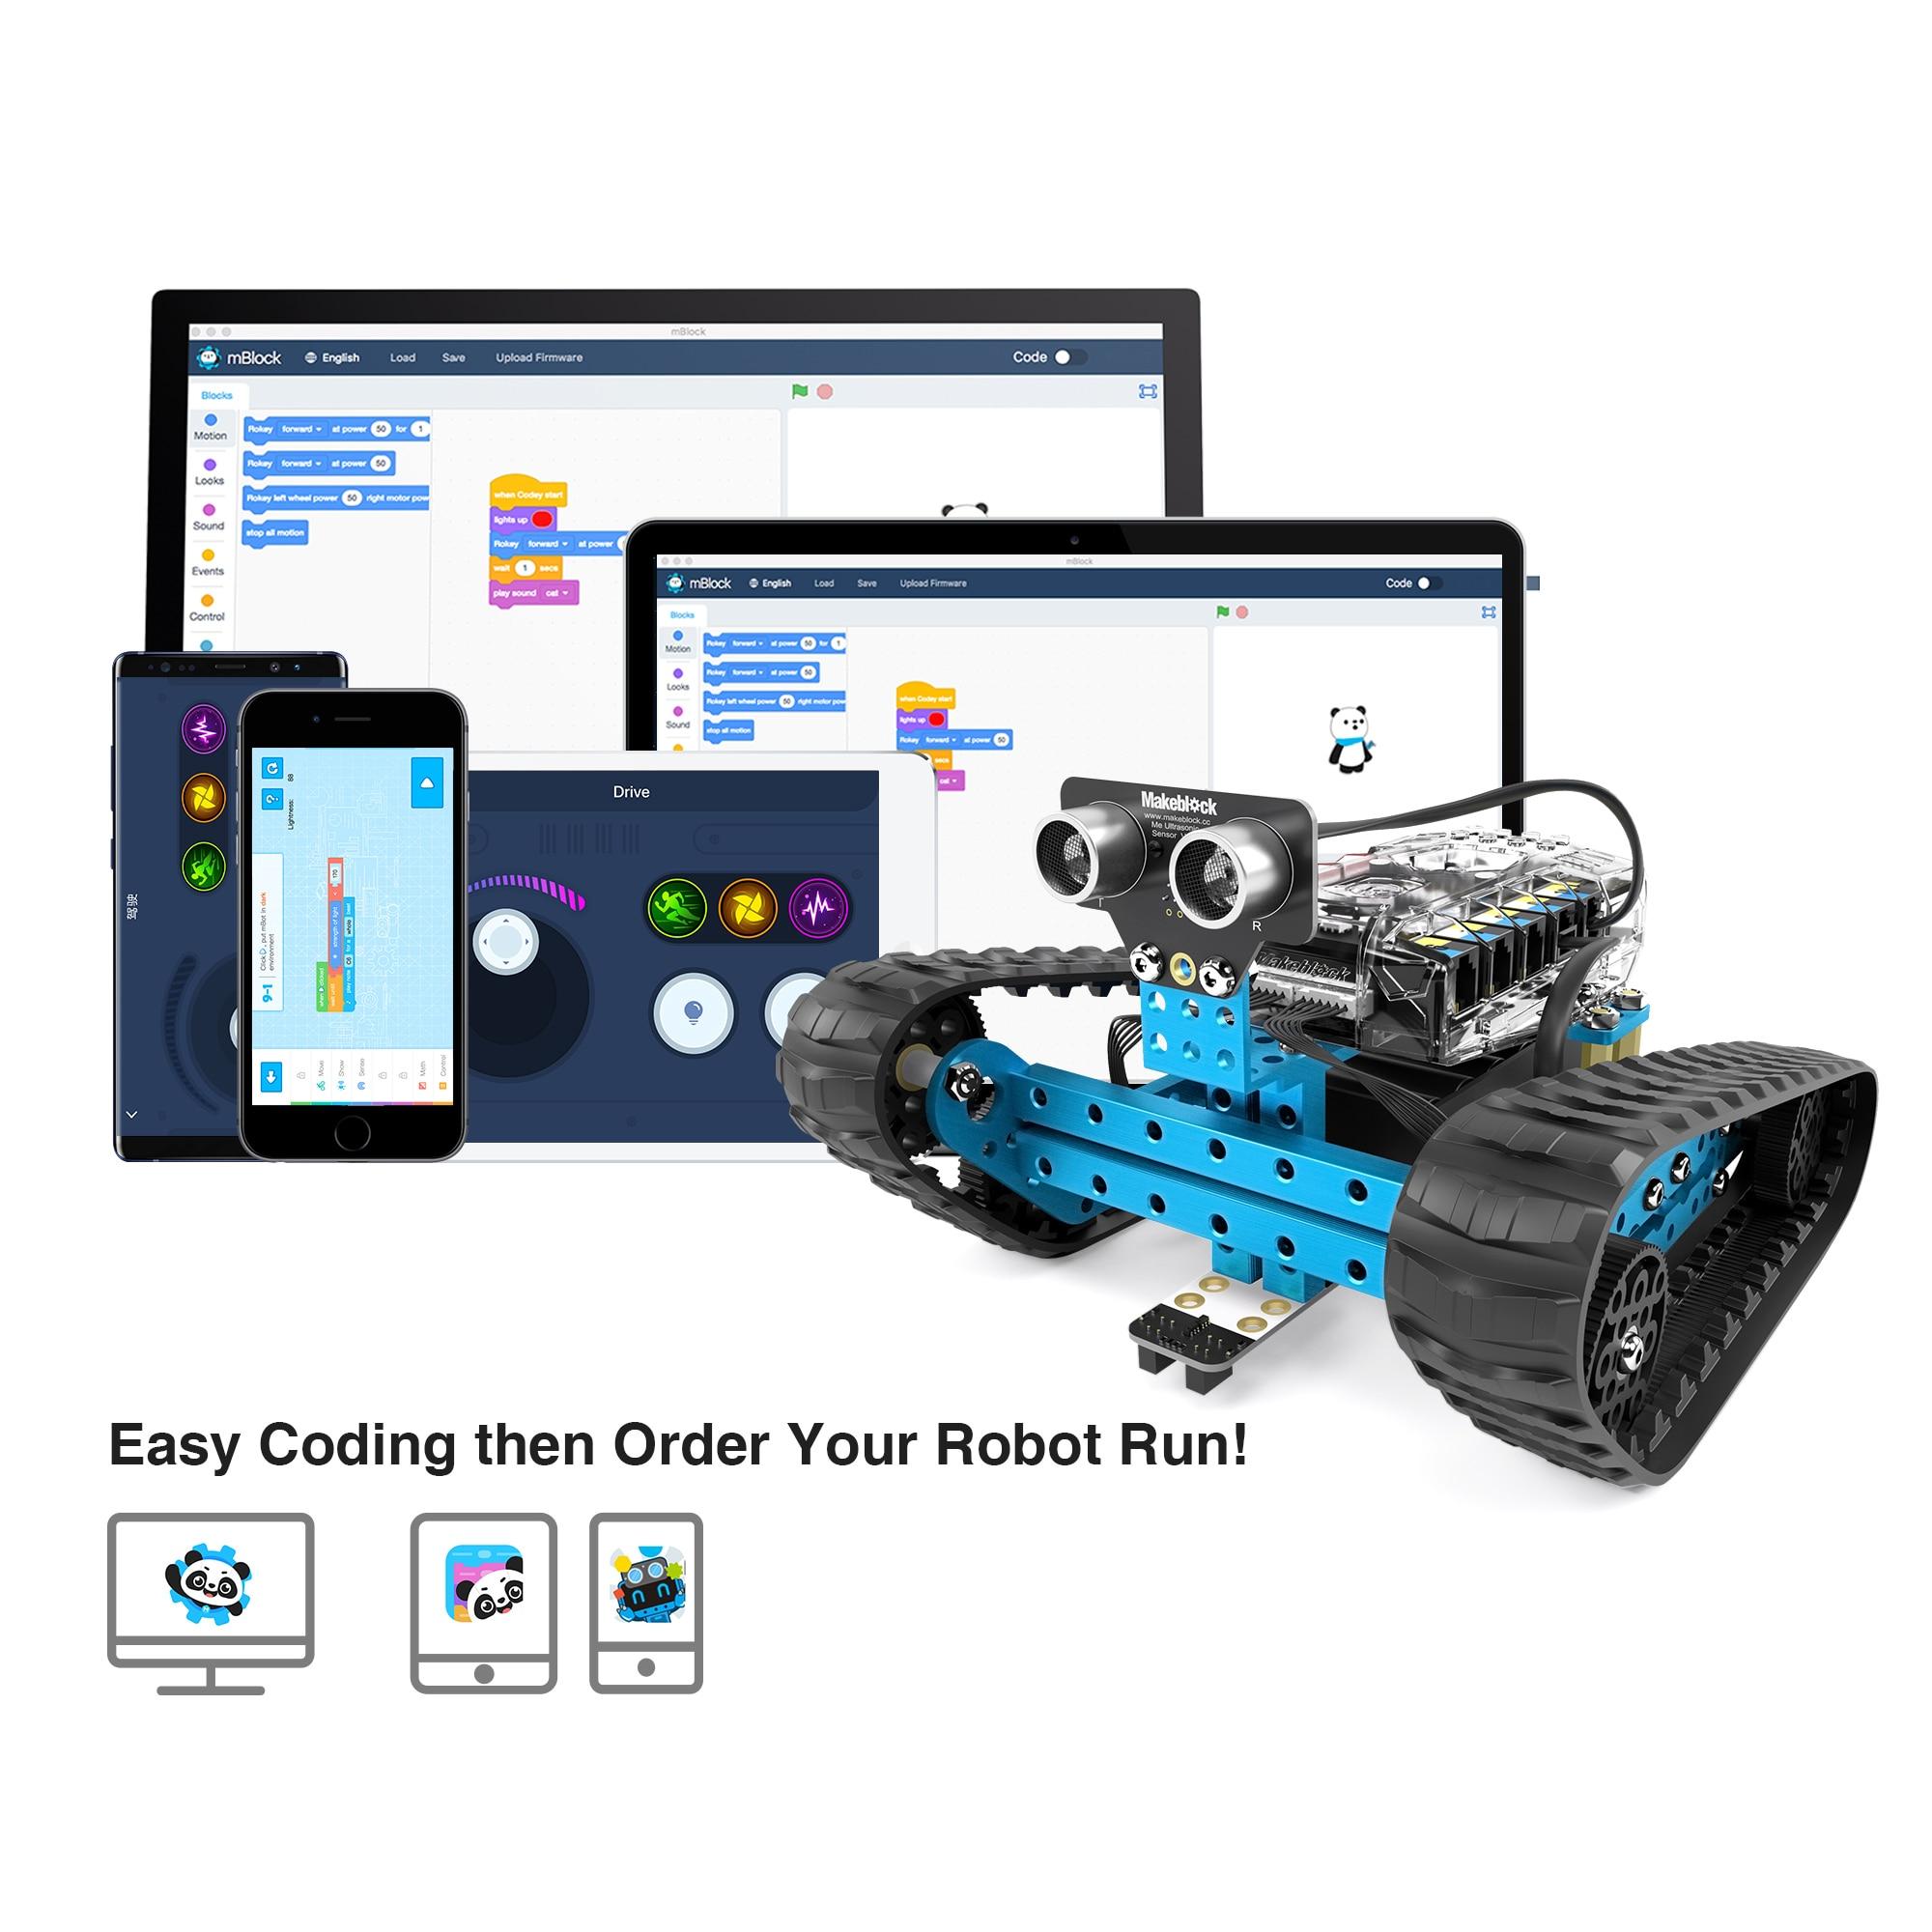 Makeblock Programmable mBot Ranger Robot Kit, Arduino,STEM Education, 3 in 1 Programmable Robotic for Kids, Age 12+ 5